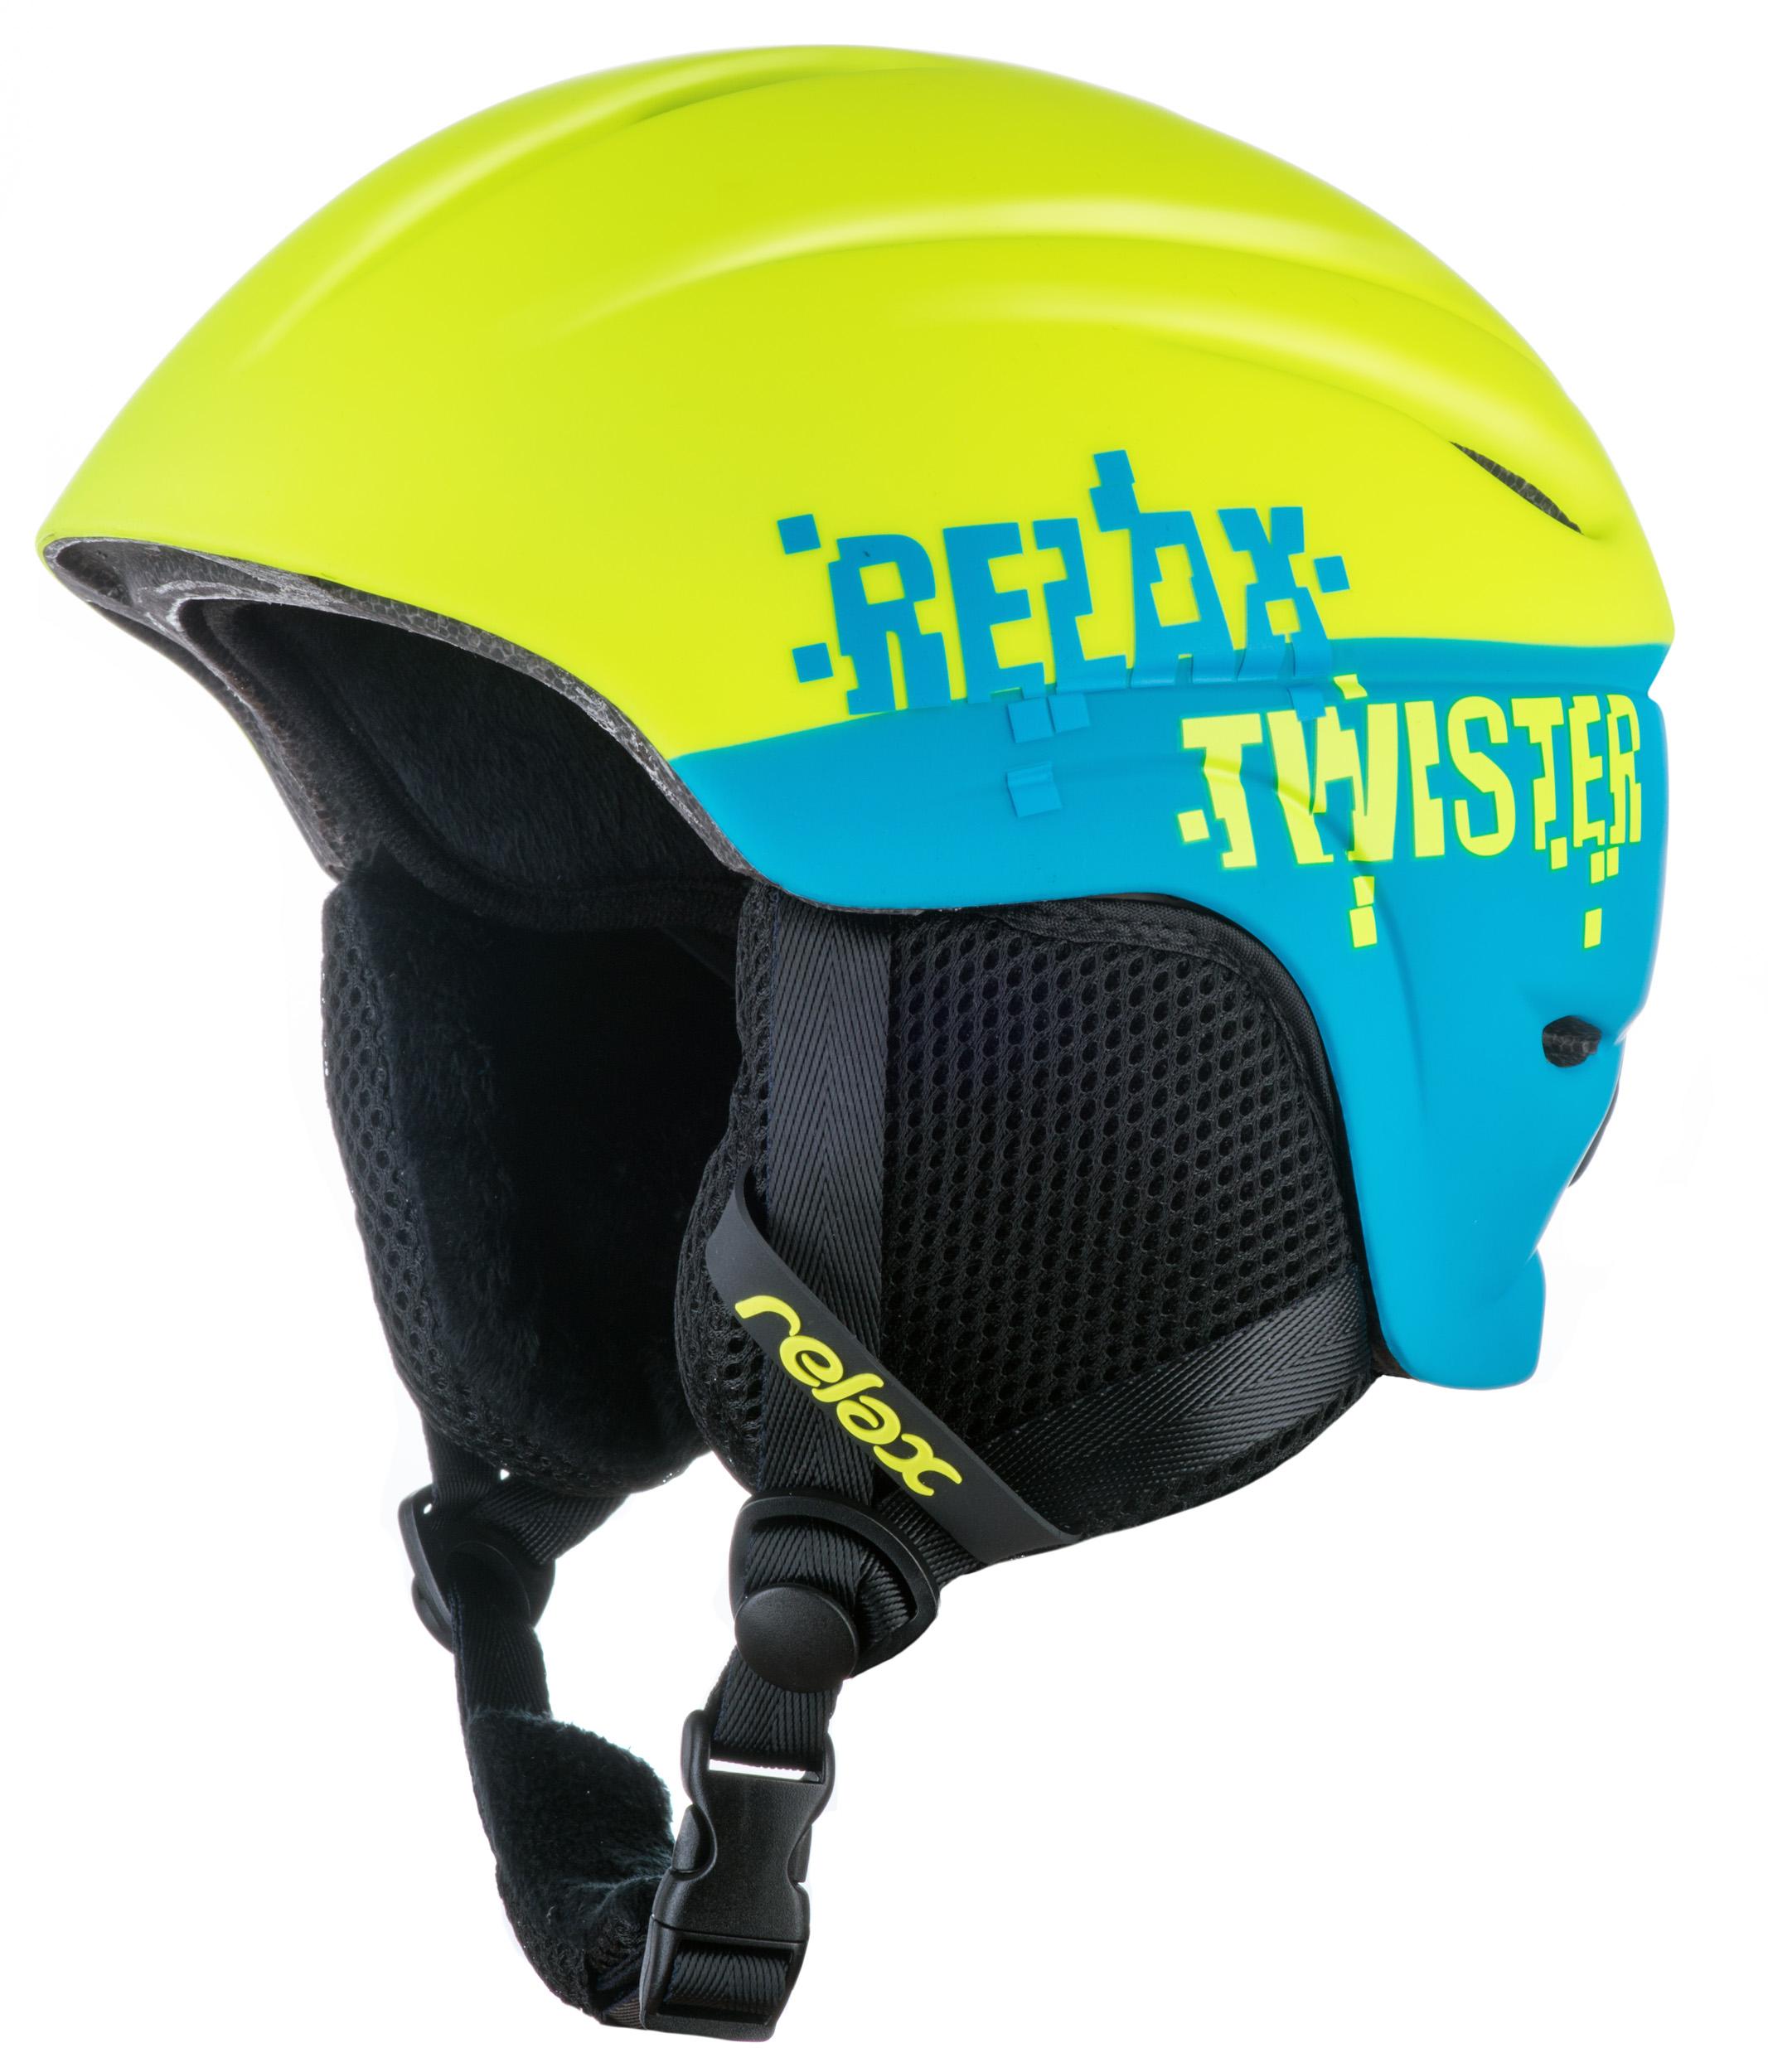 Relax Twister RH18V detská lyžiarska prilba žltá-modrá matná 1c82b8c0d0d